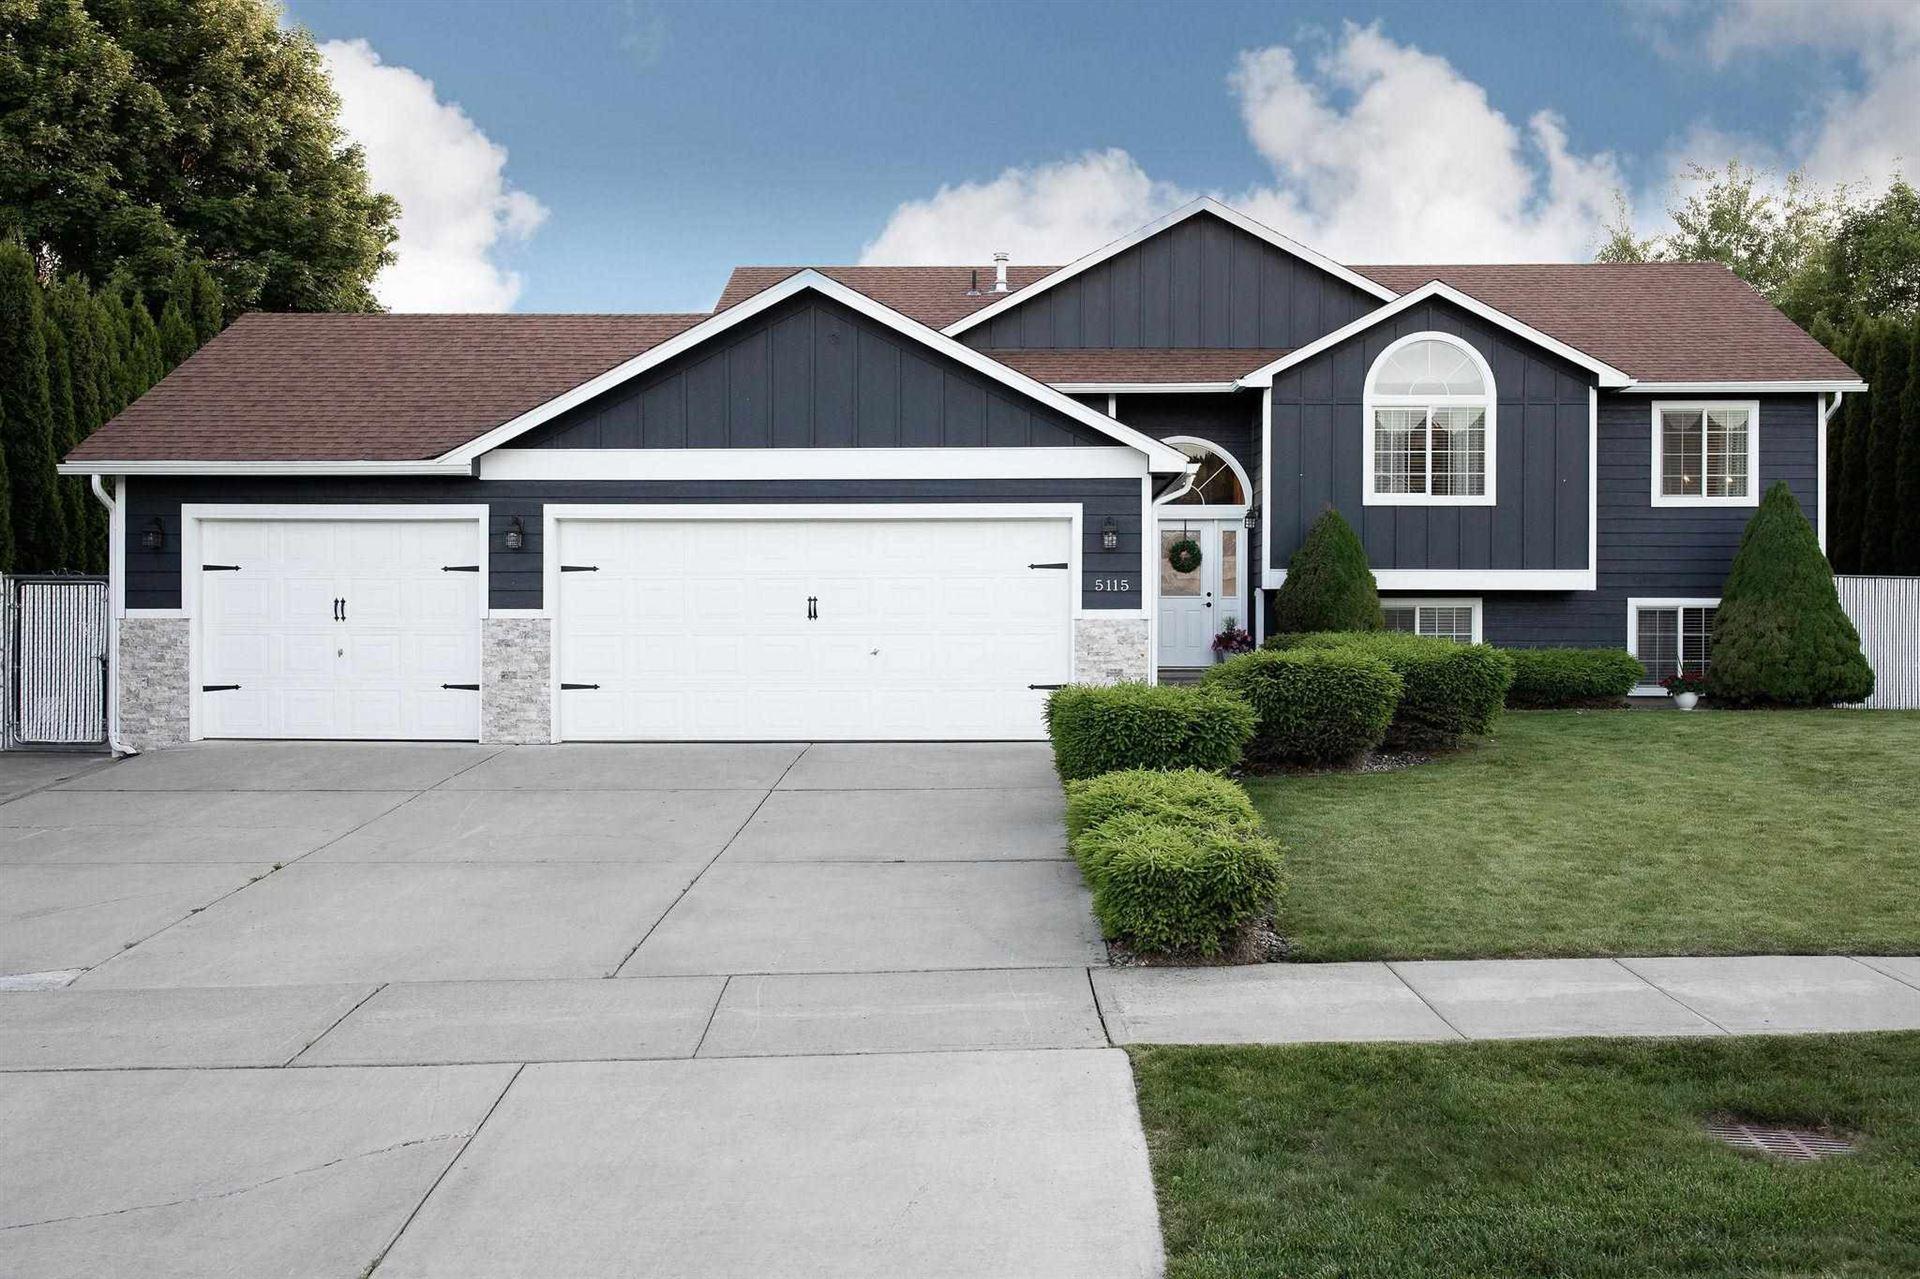 5115 N Calvin Rd, Spokane Valley, WA 99216 - #: 202117472